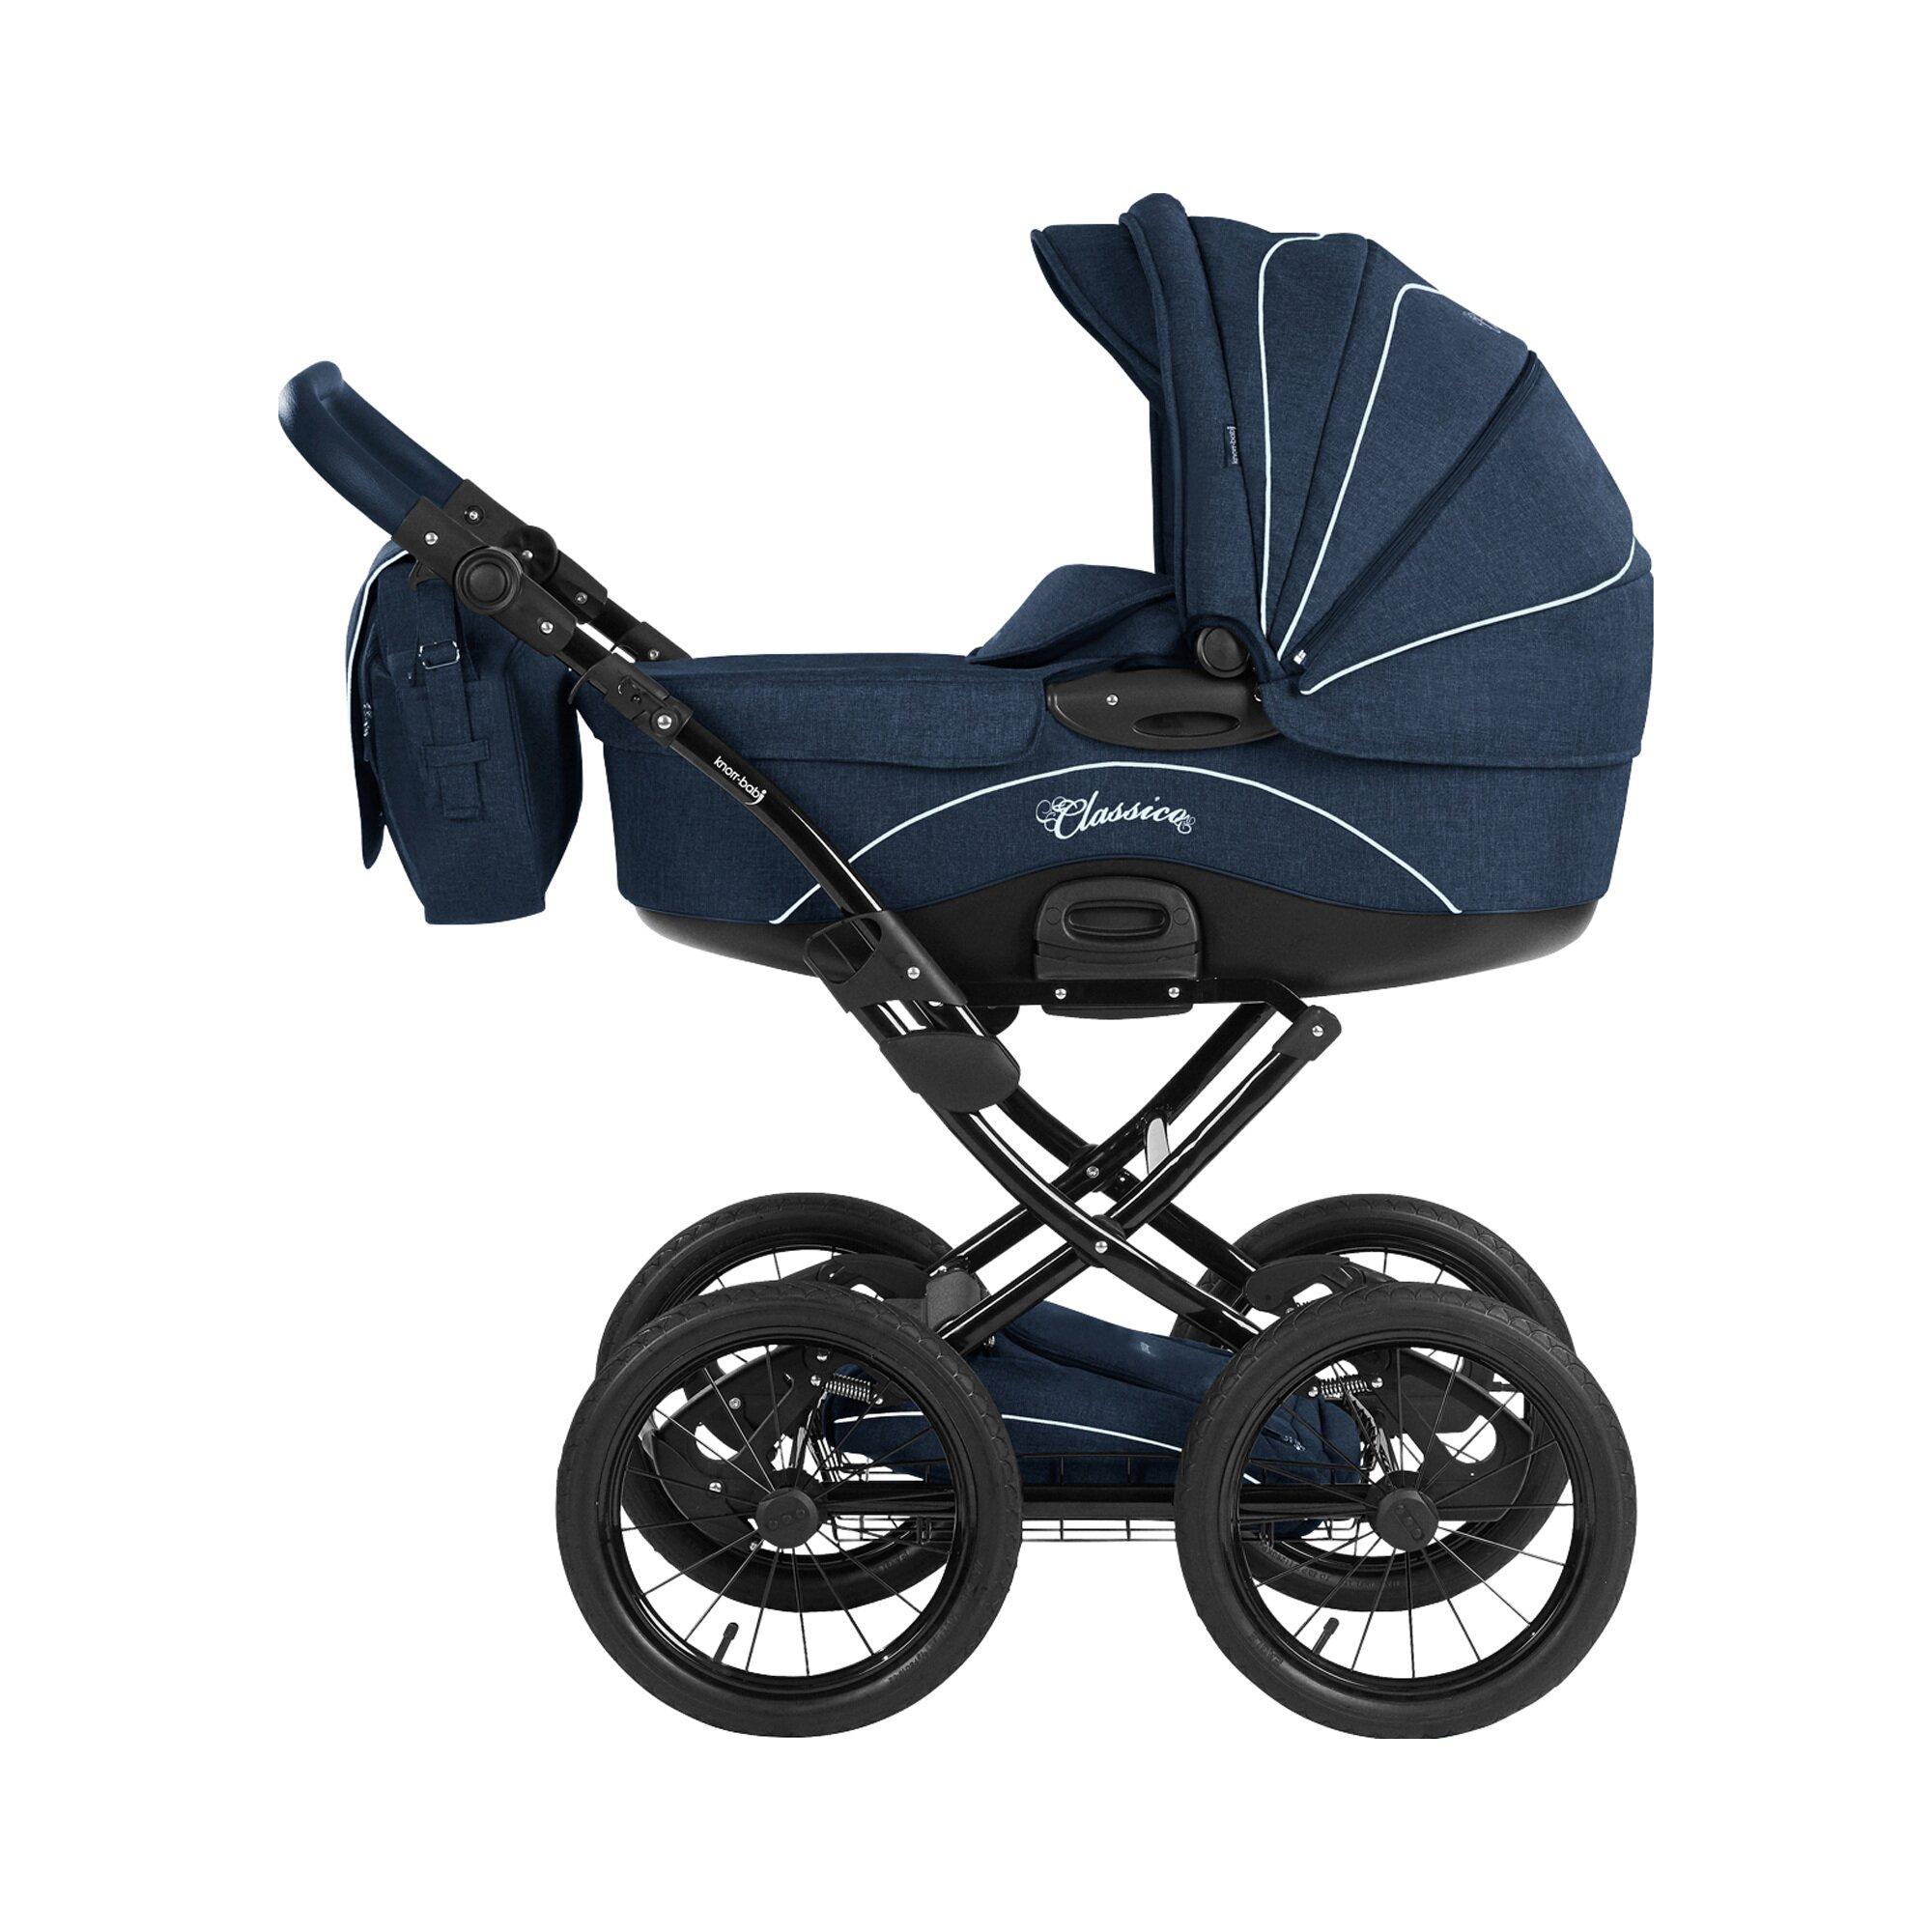 knorr-baby-classico-kombikinderwagen-denim